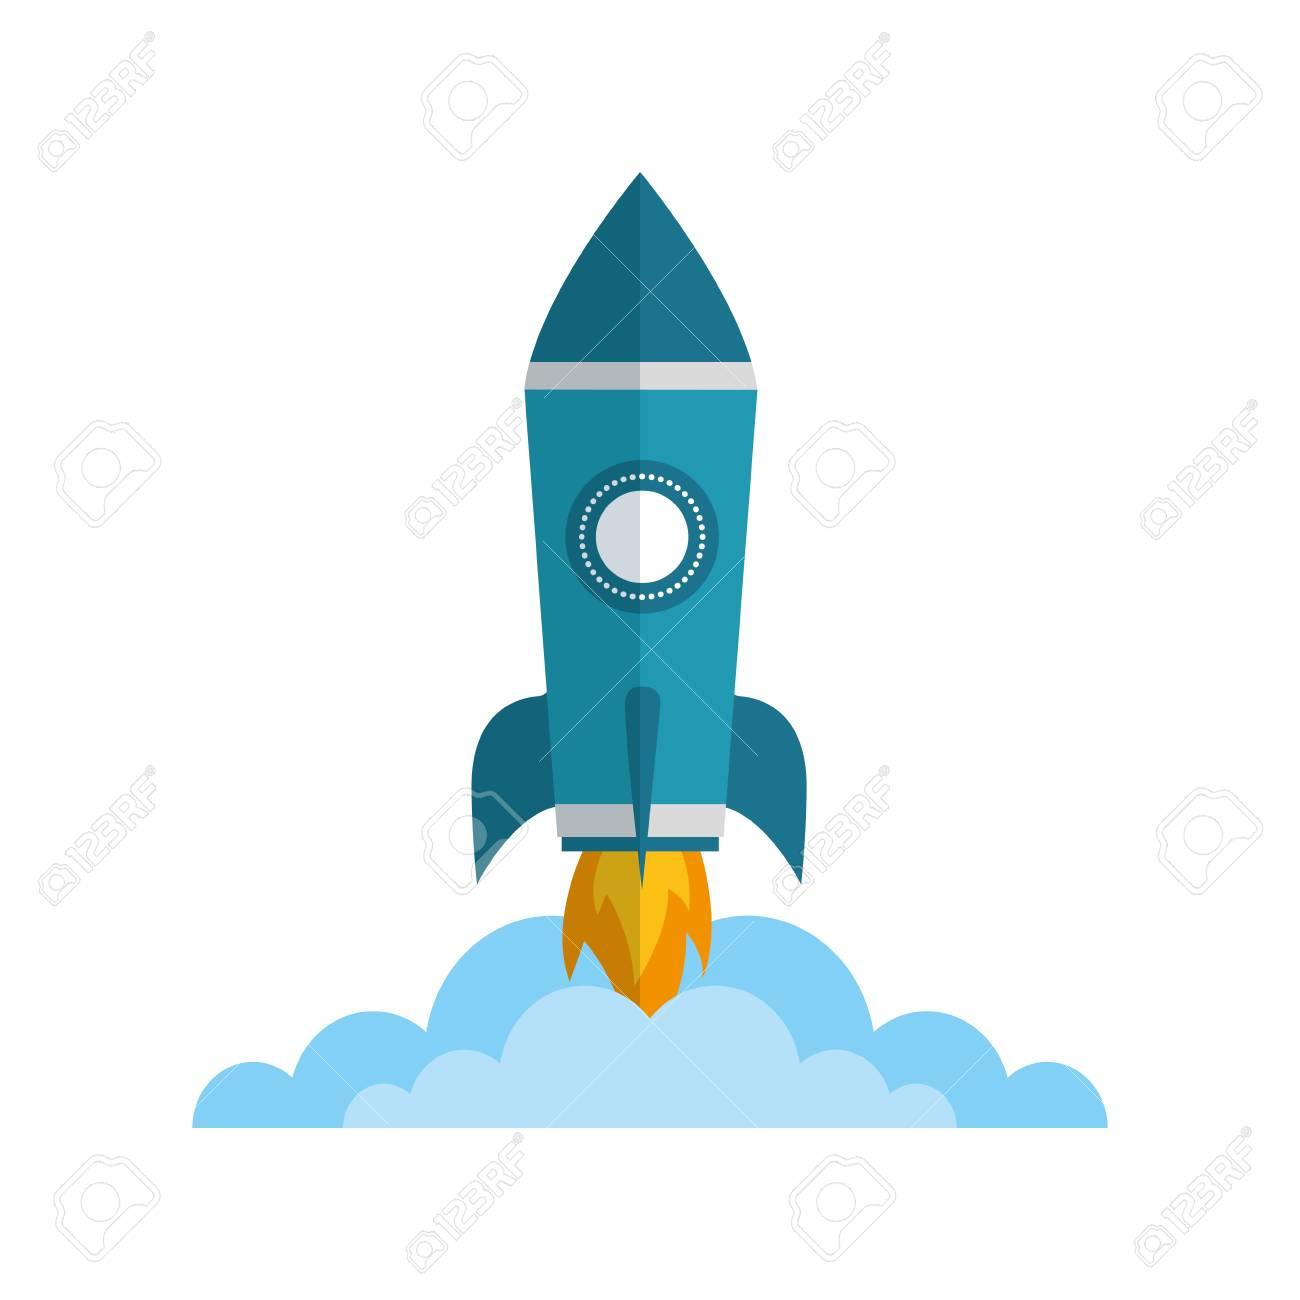 rocket launch startup cartoon image vector illustration - 111927808